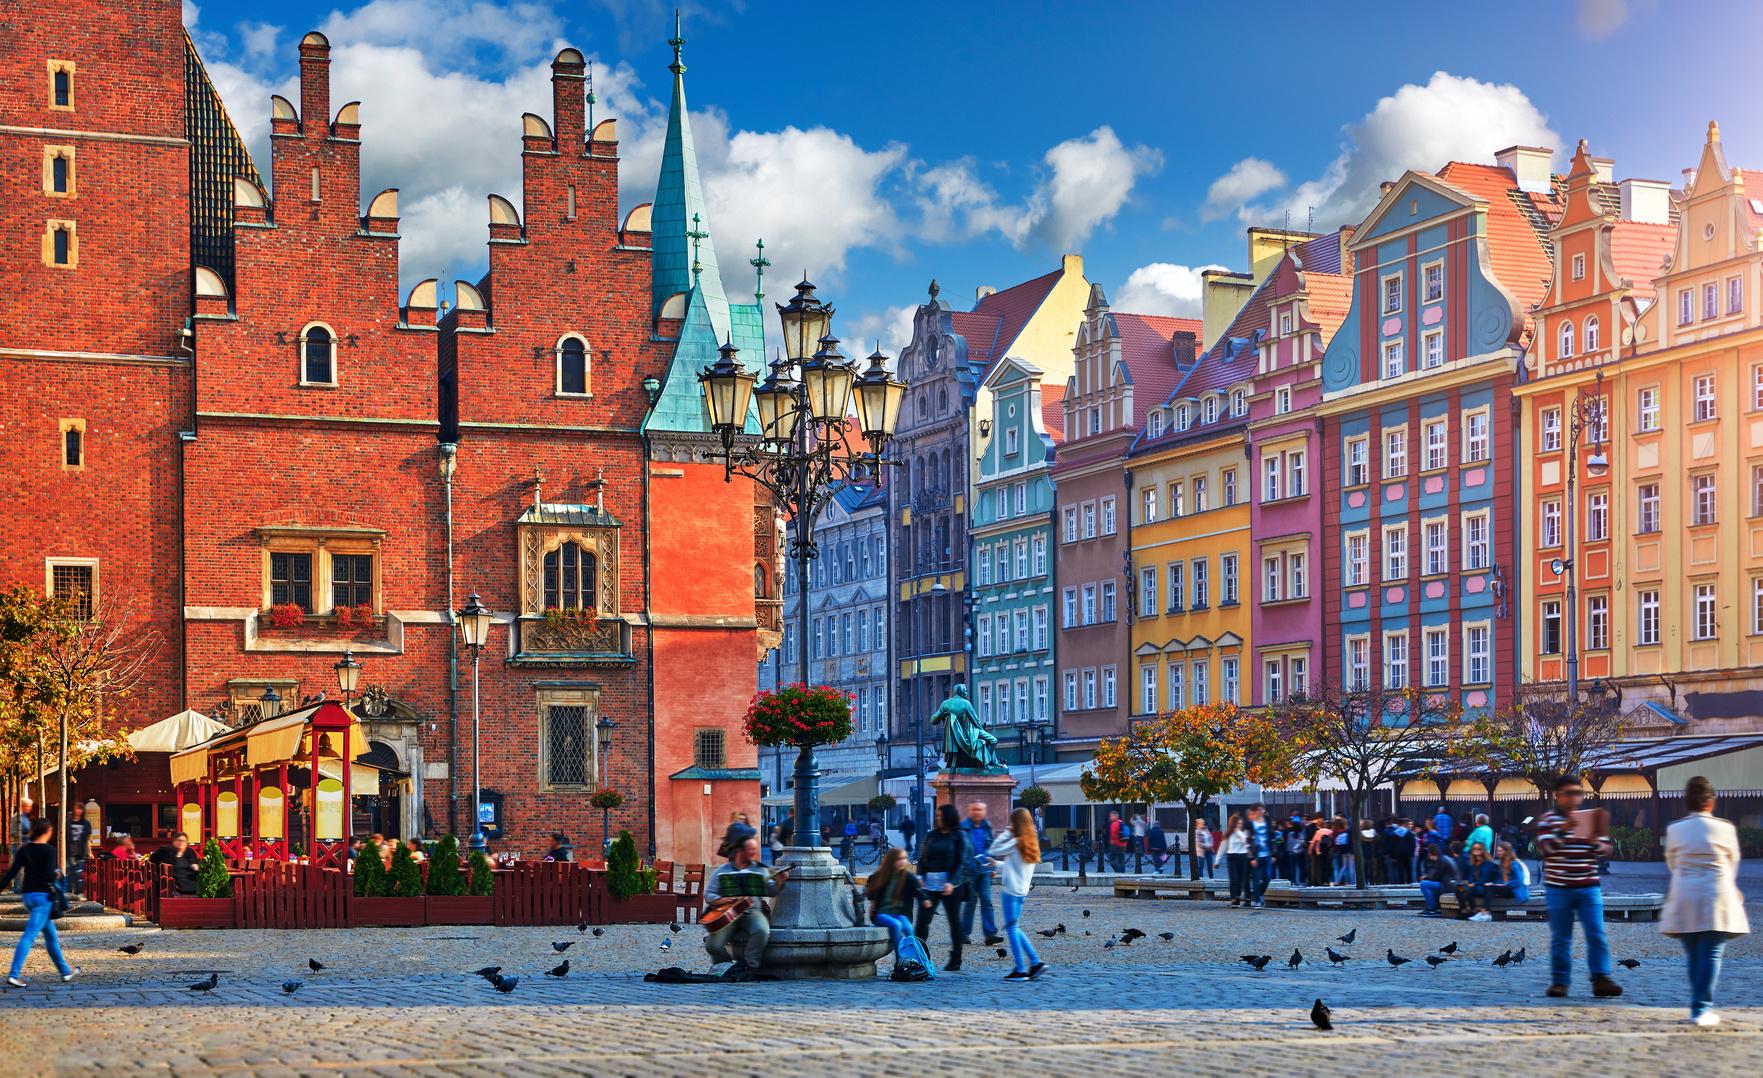 Alt du bør vite om Wrocław